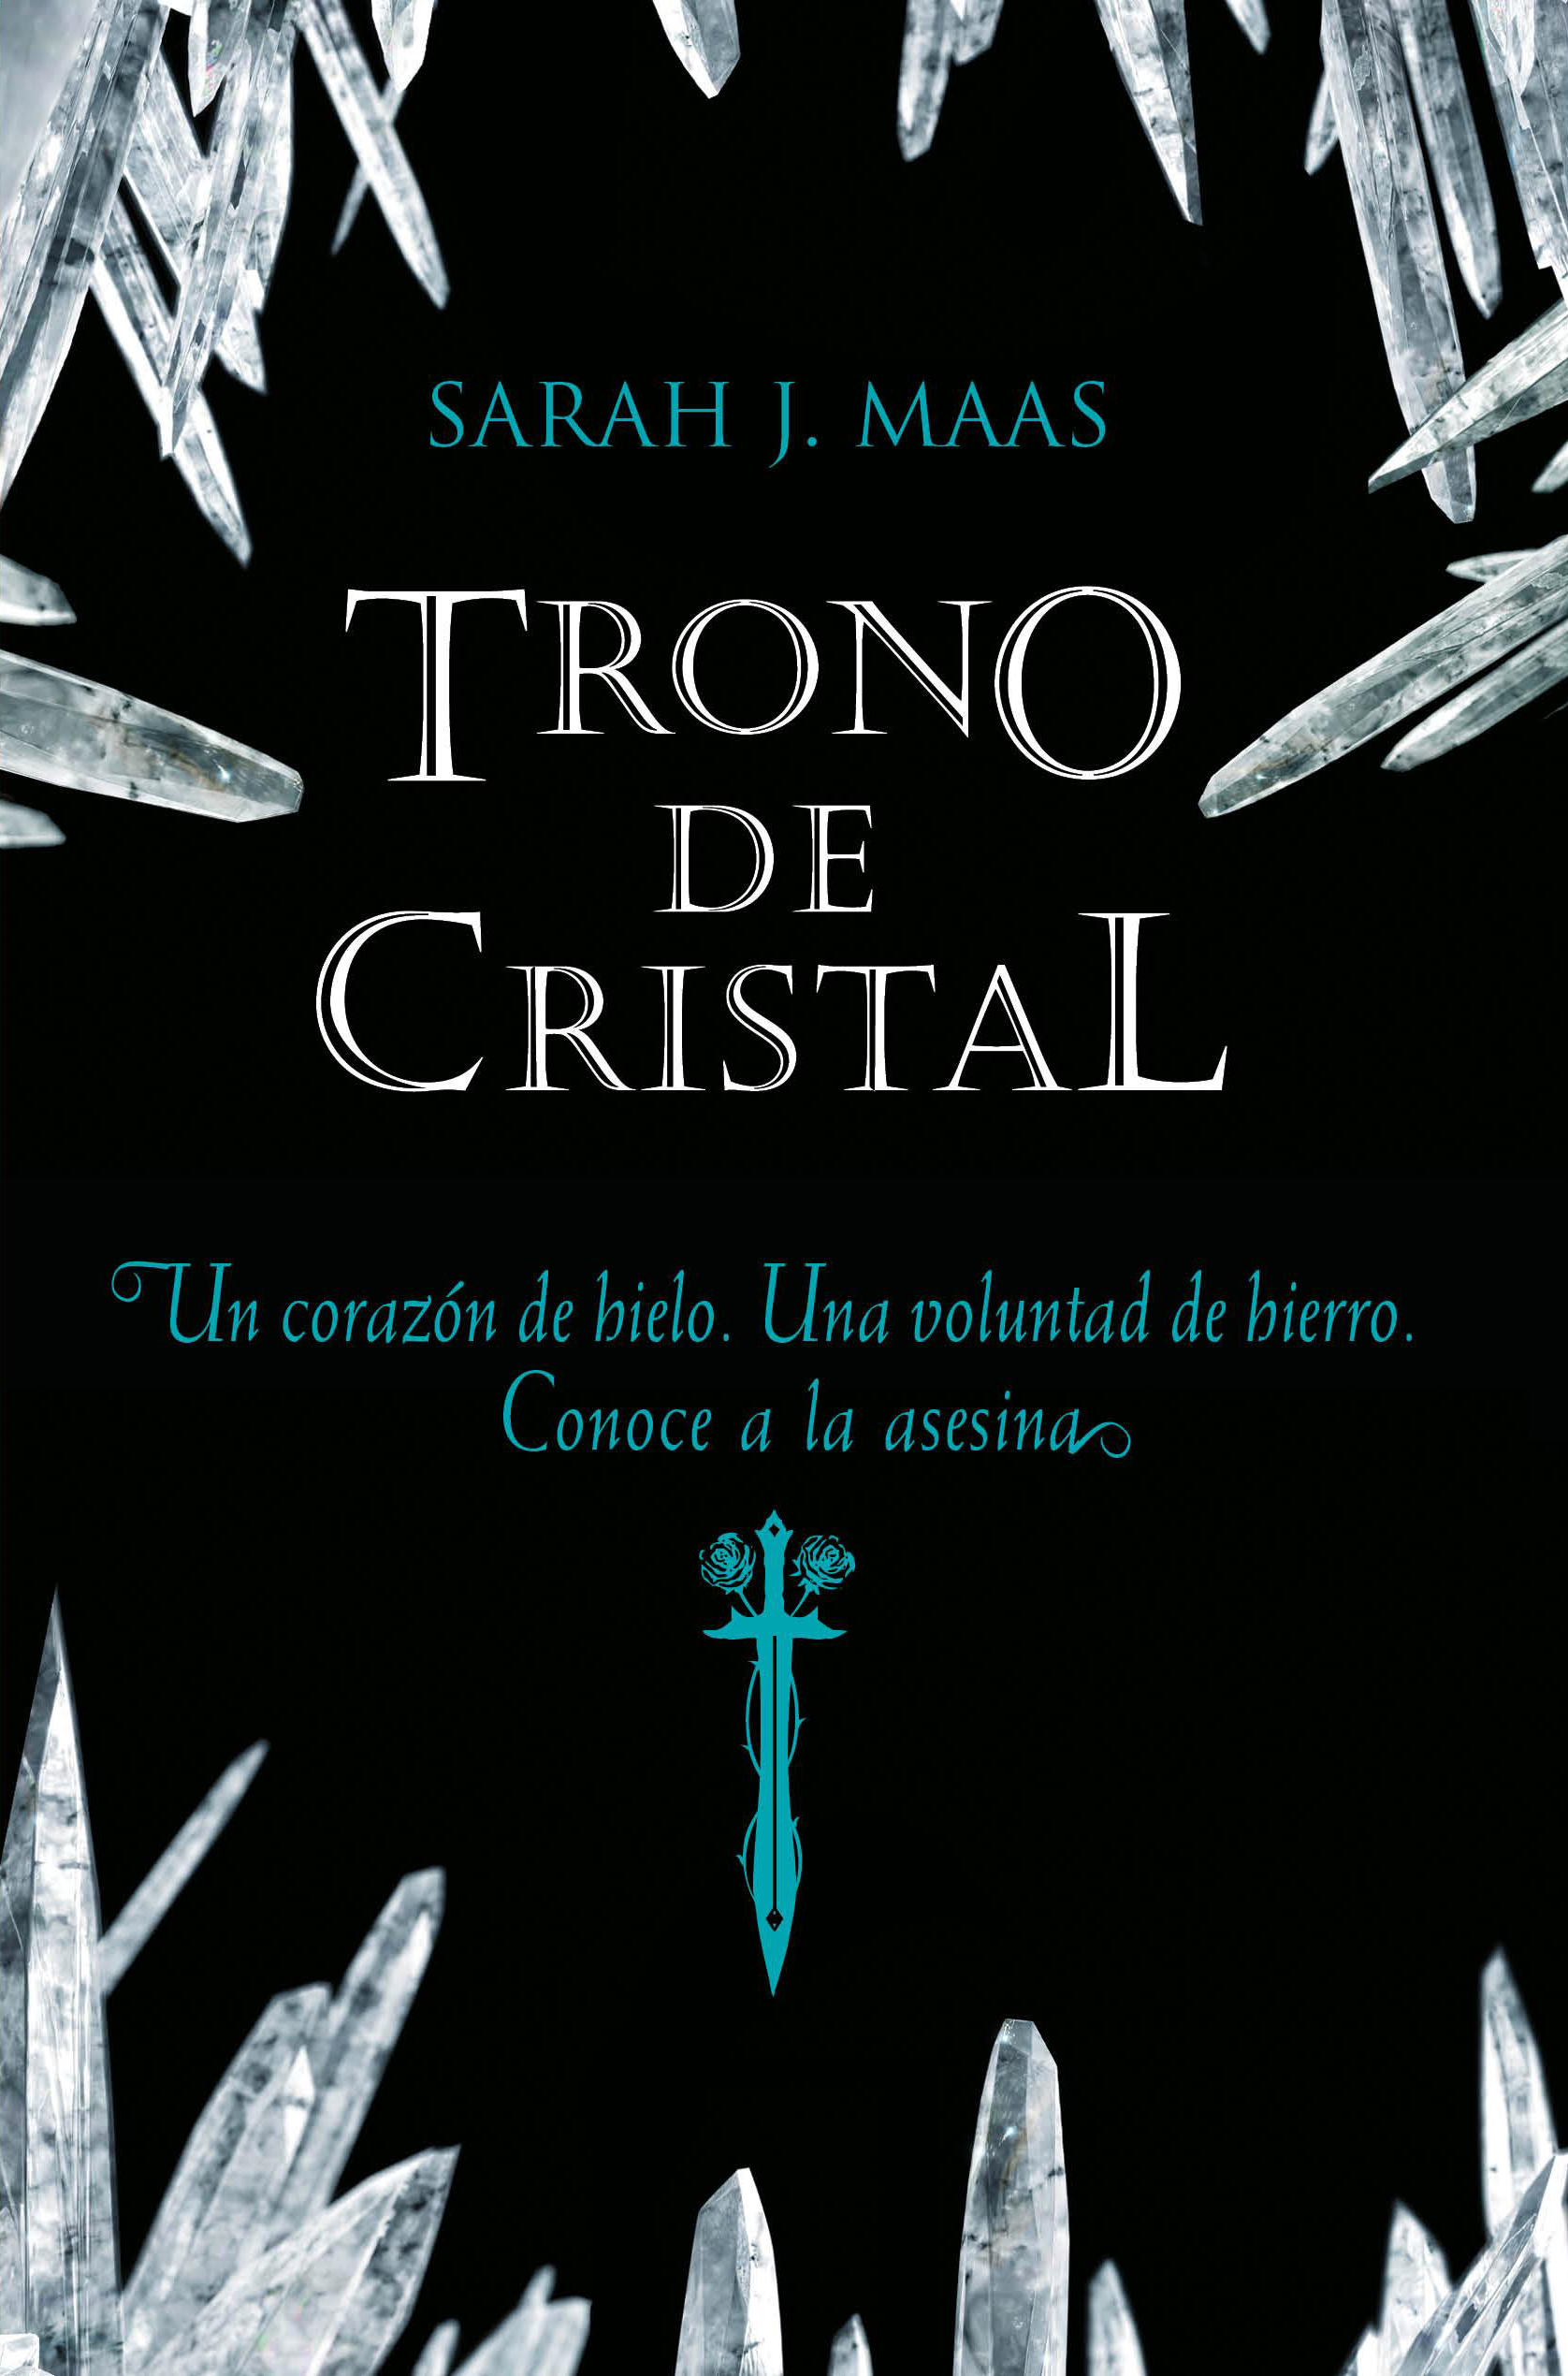 Resultado de imagen de trono de cristal portada